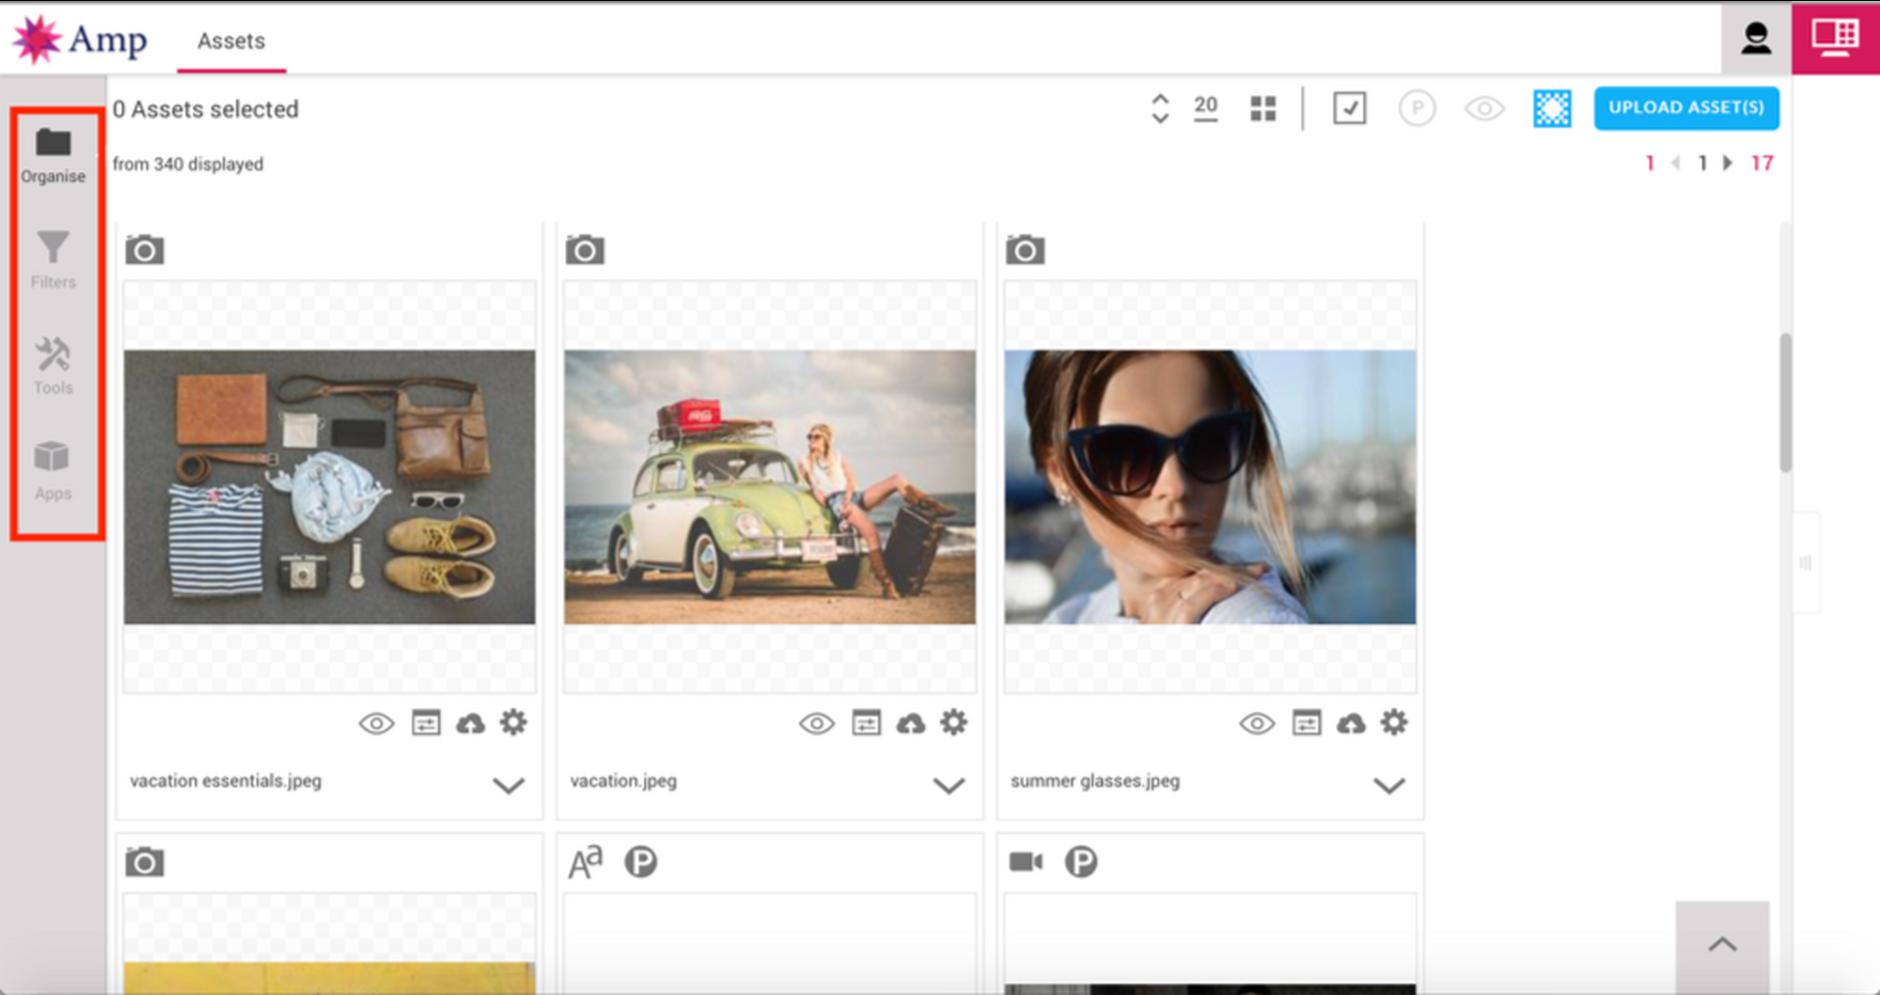 The main Content Hub screen